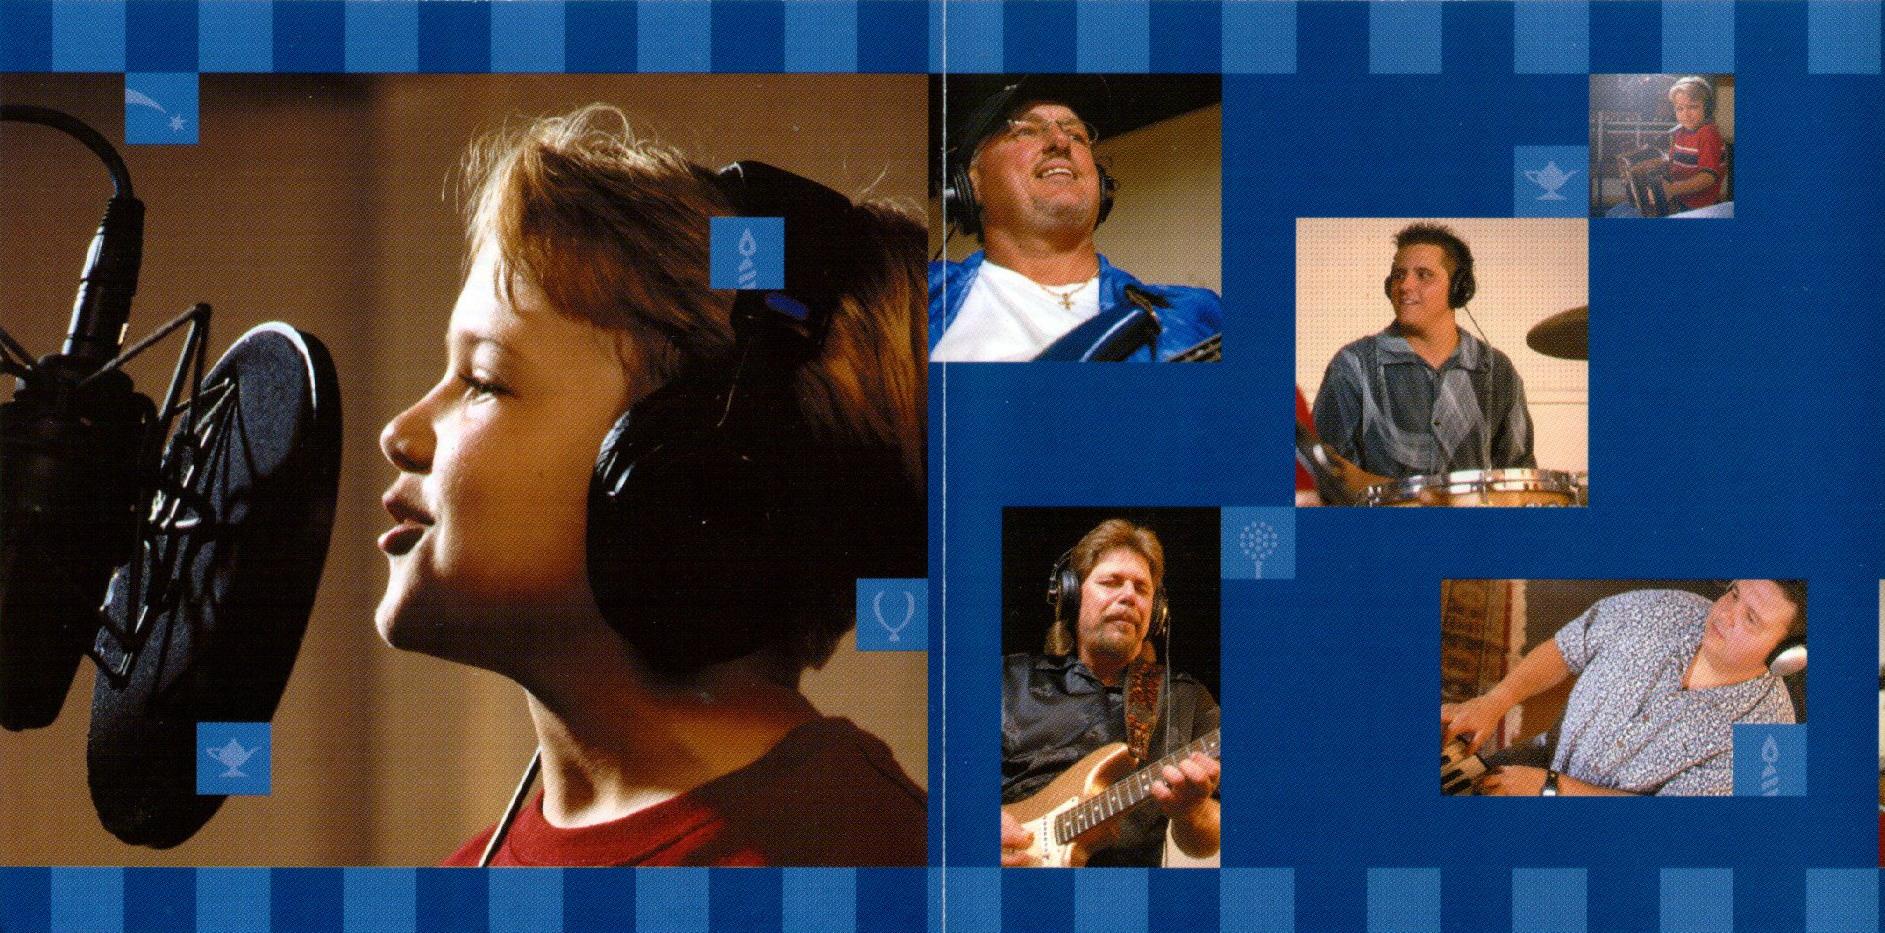 Photos of Make A Wish @ kidsmusic